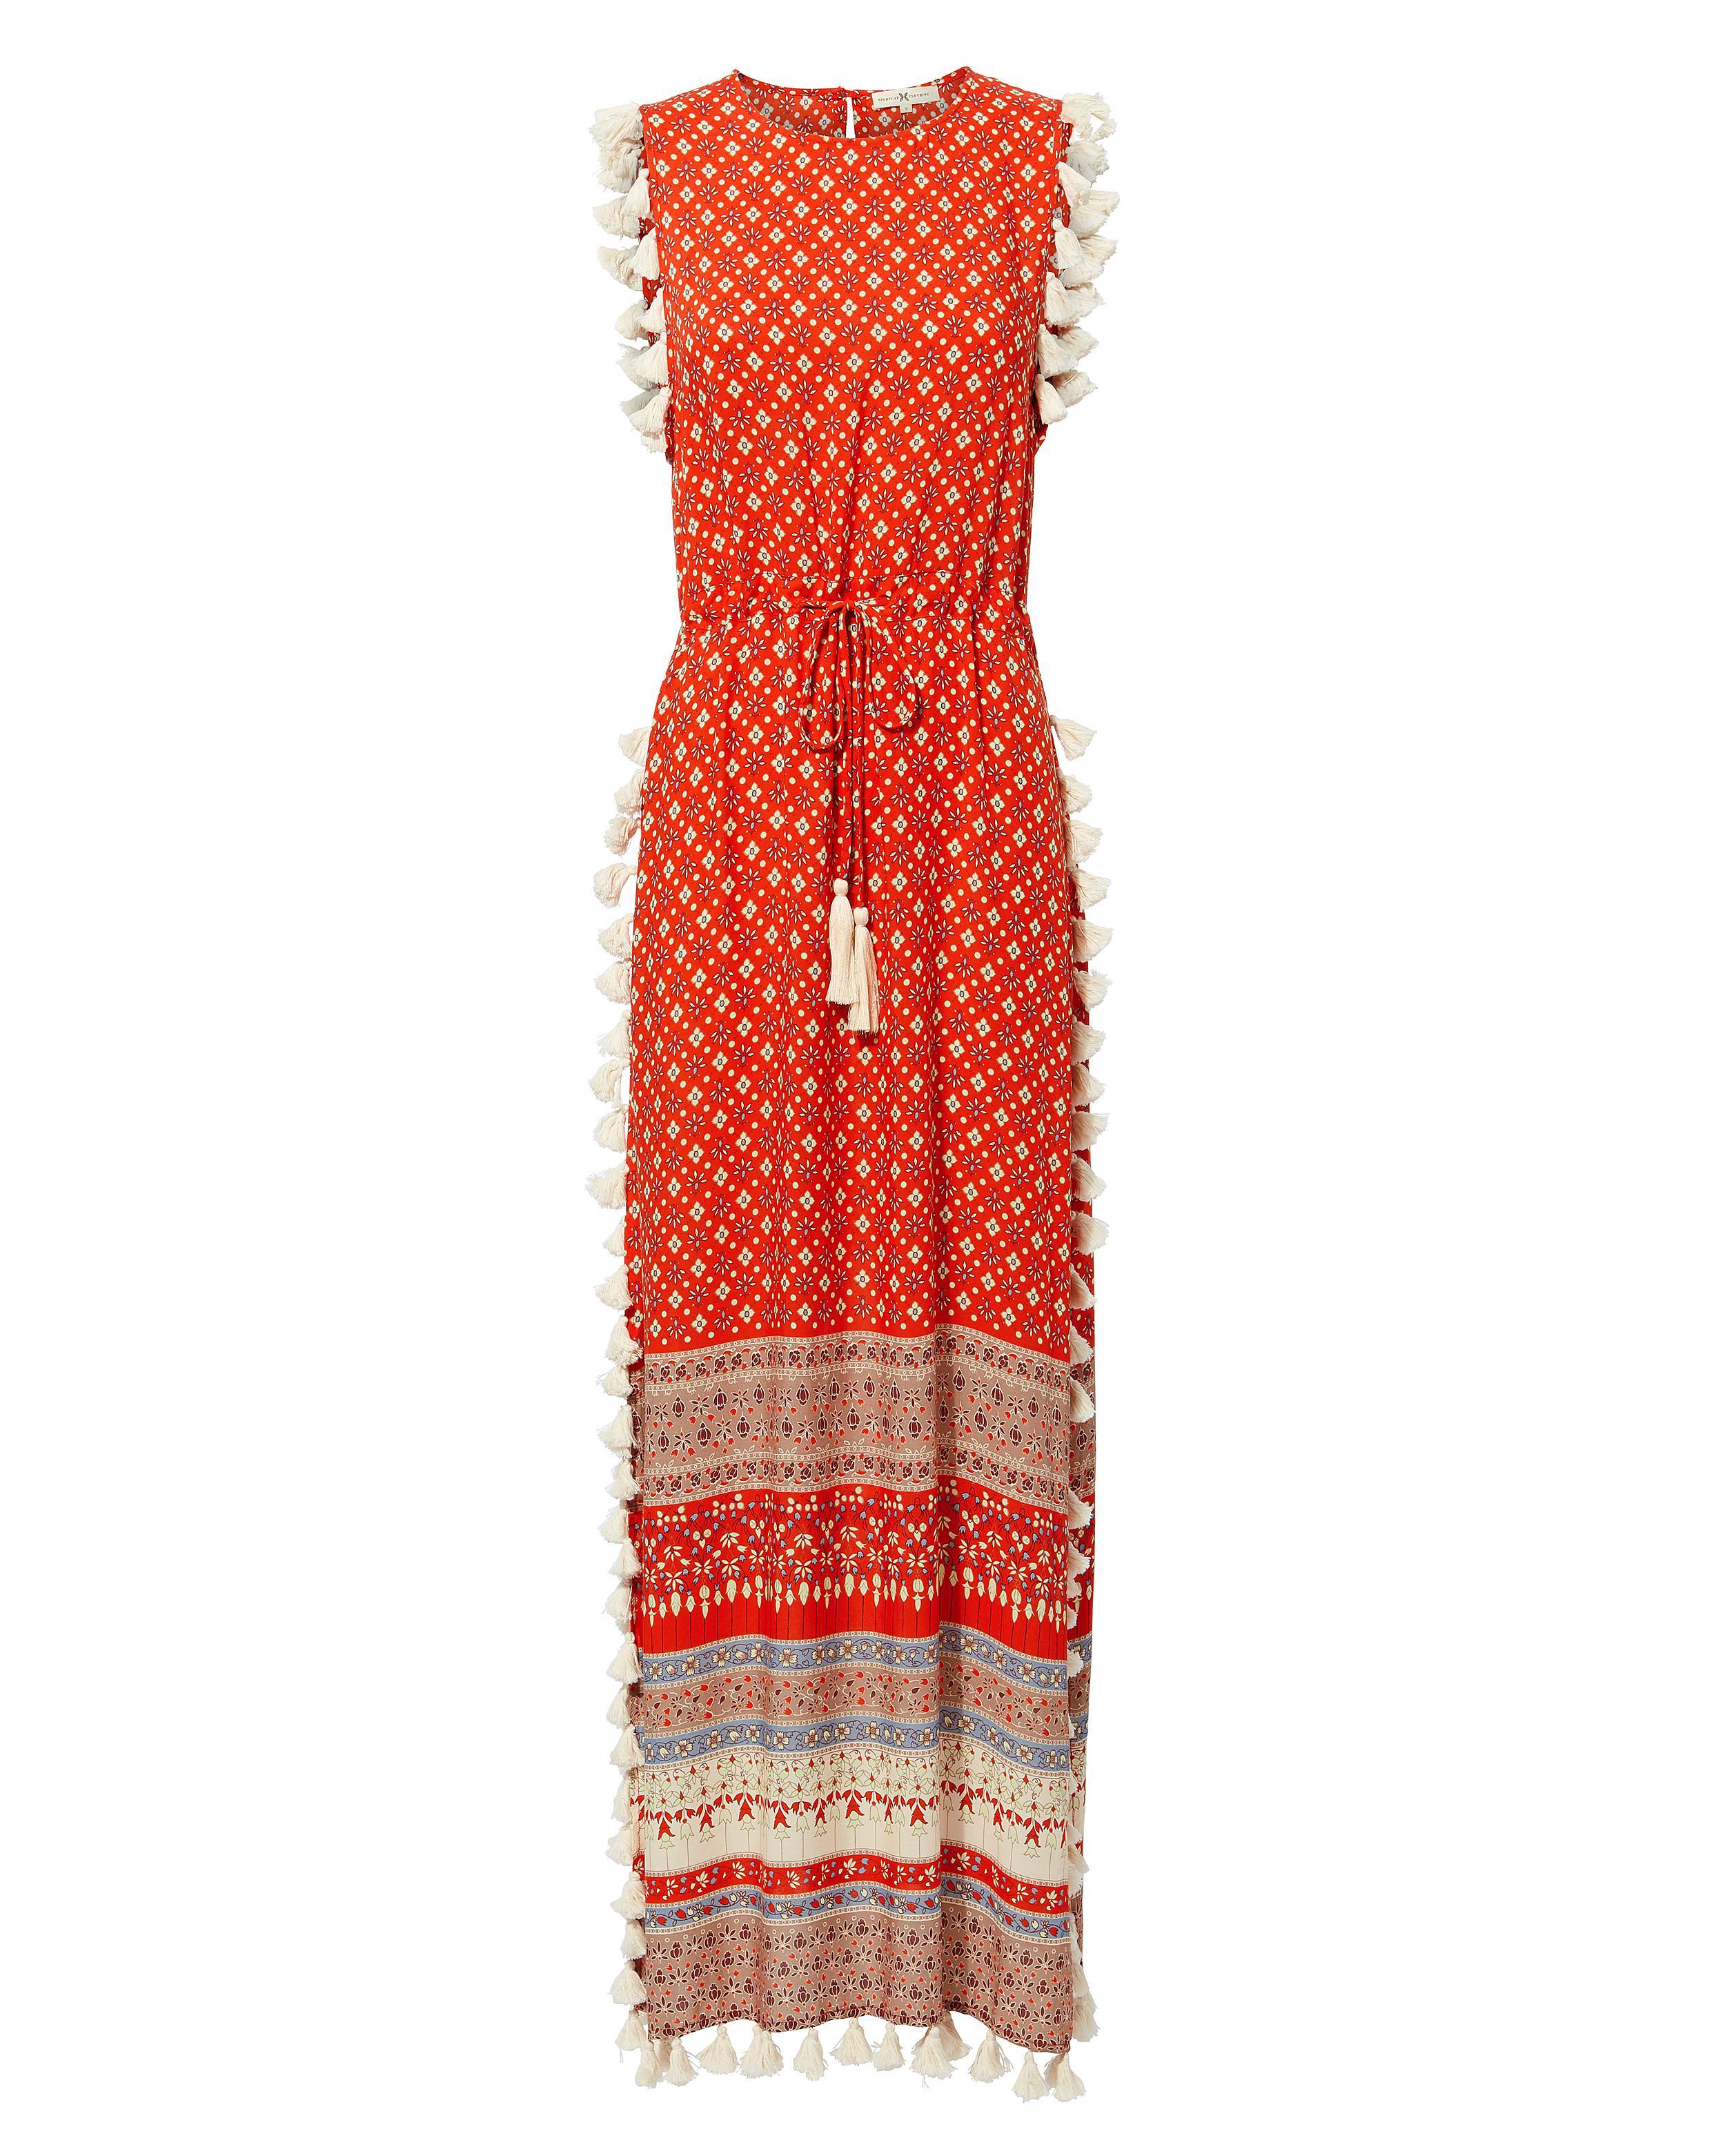 1be5b36c22705 Nightcap Pom Pom Fringe Maxi Dress in Red - Lyst